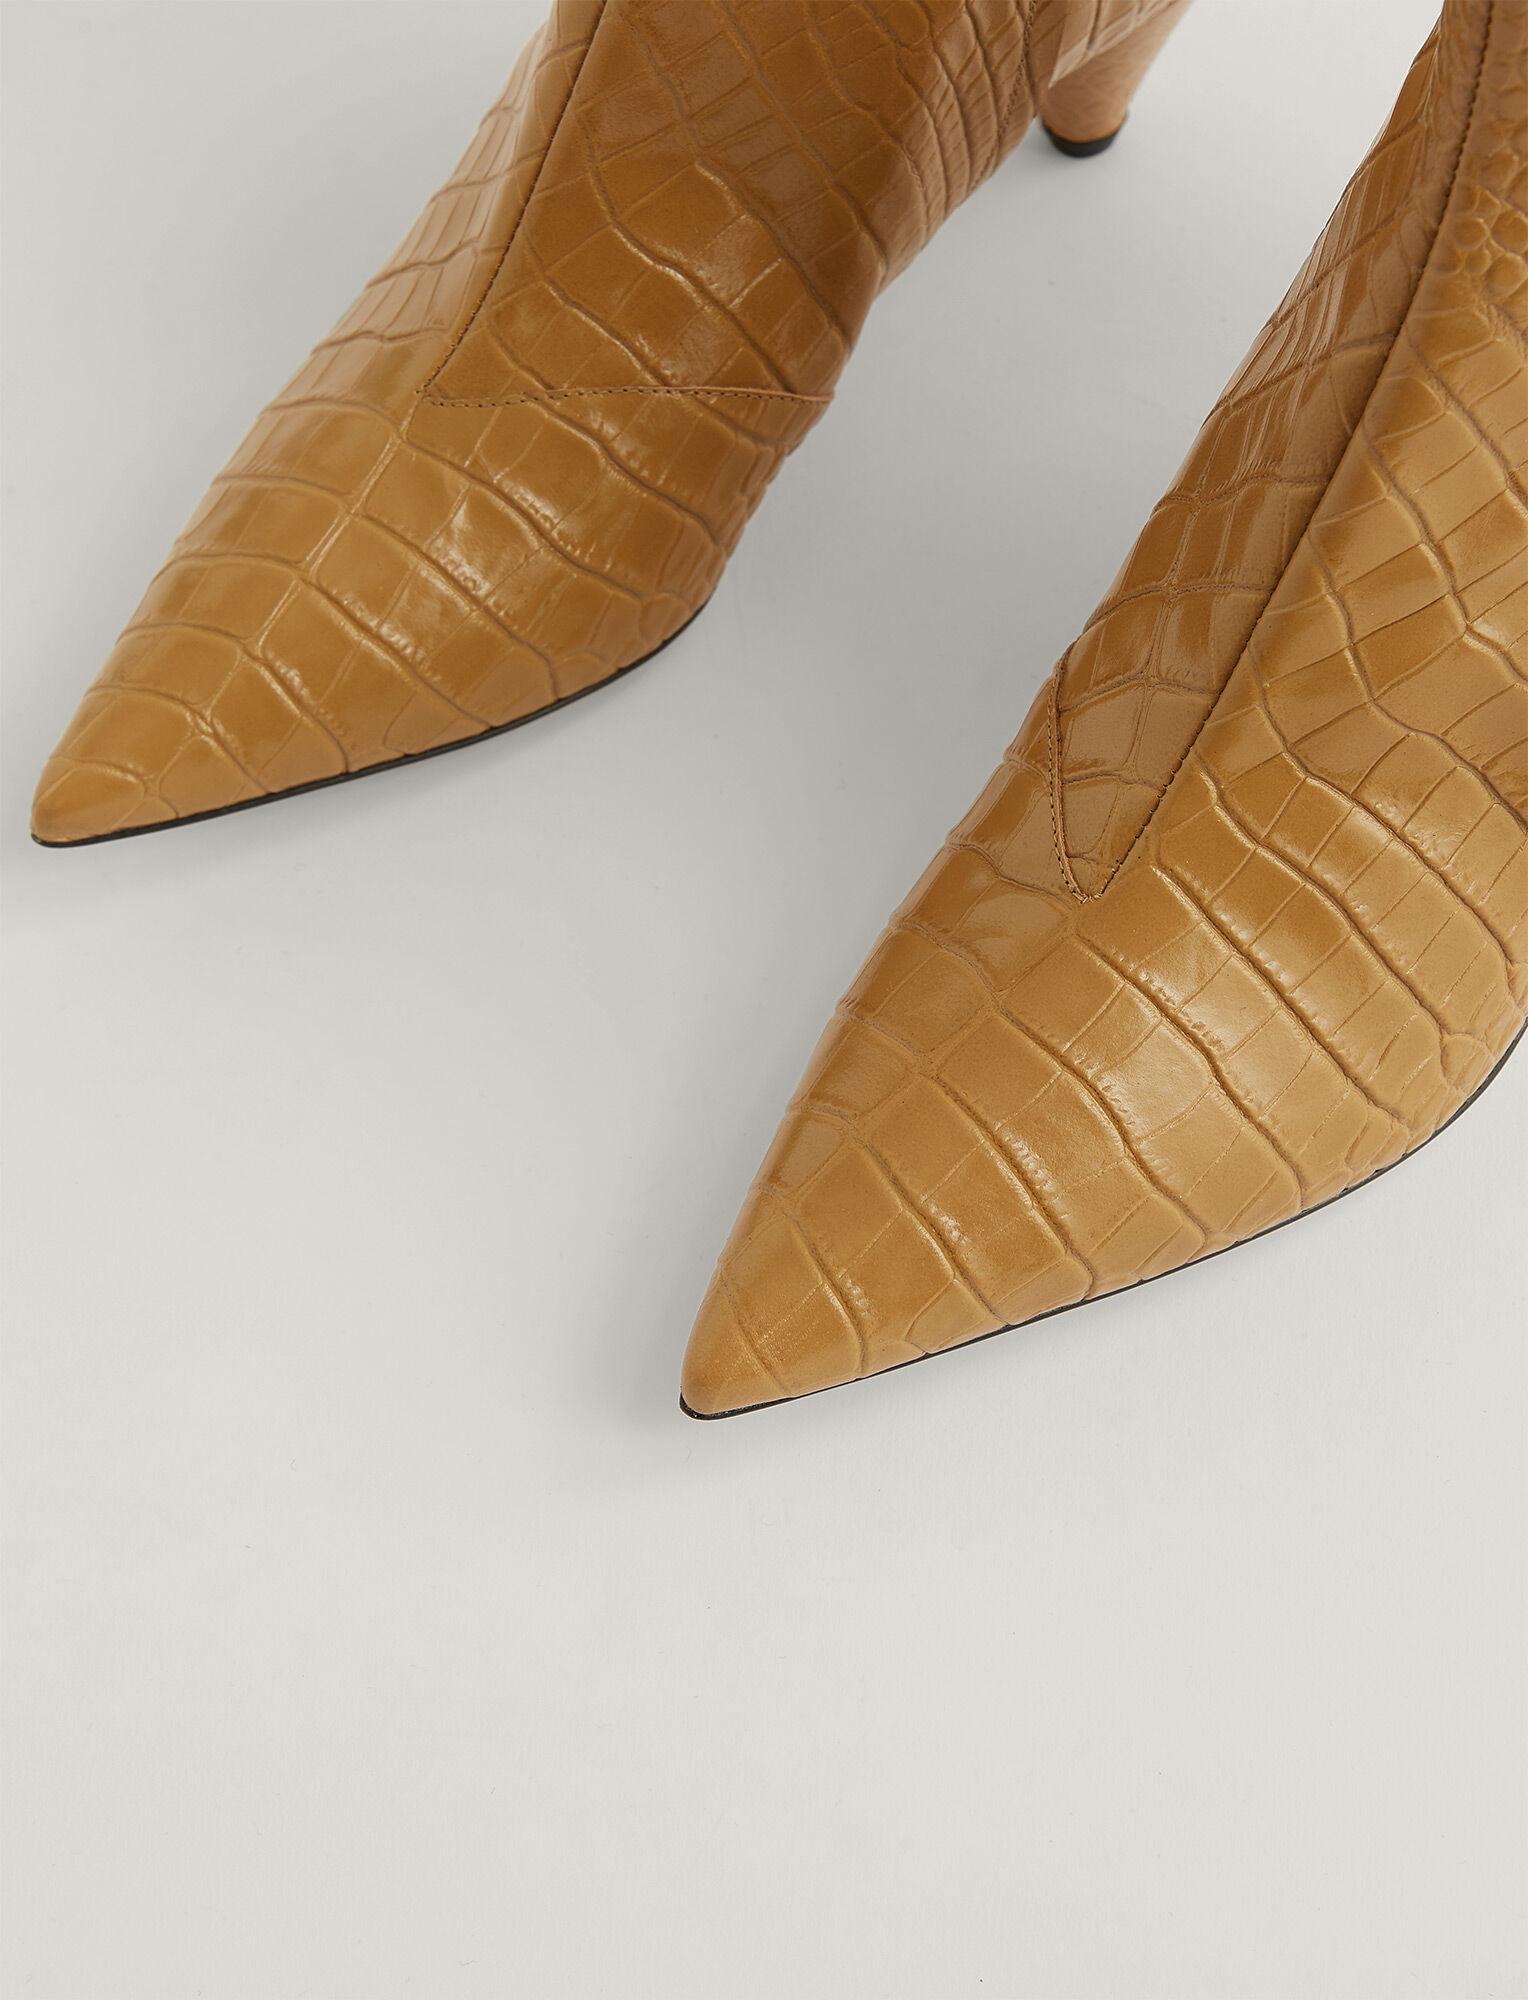 Joseph, Cone Heel Ankle Boot, in Dijon